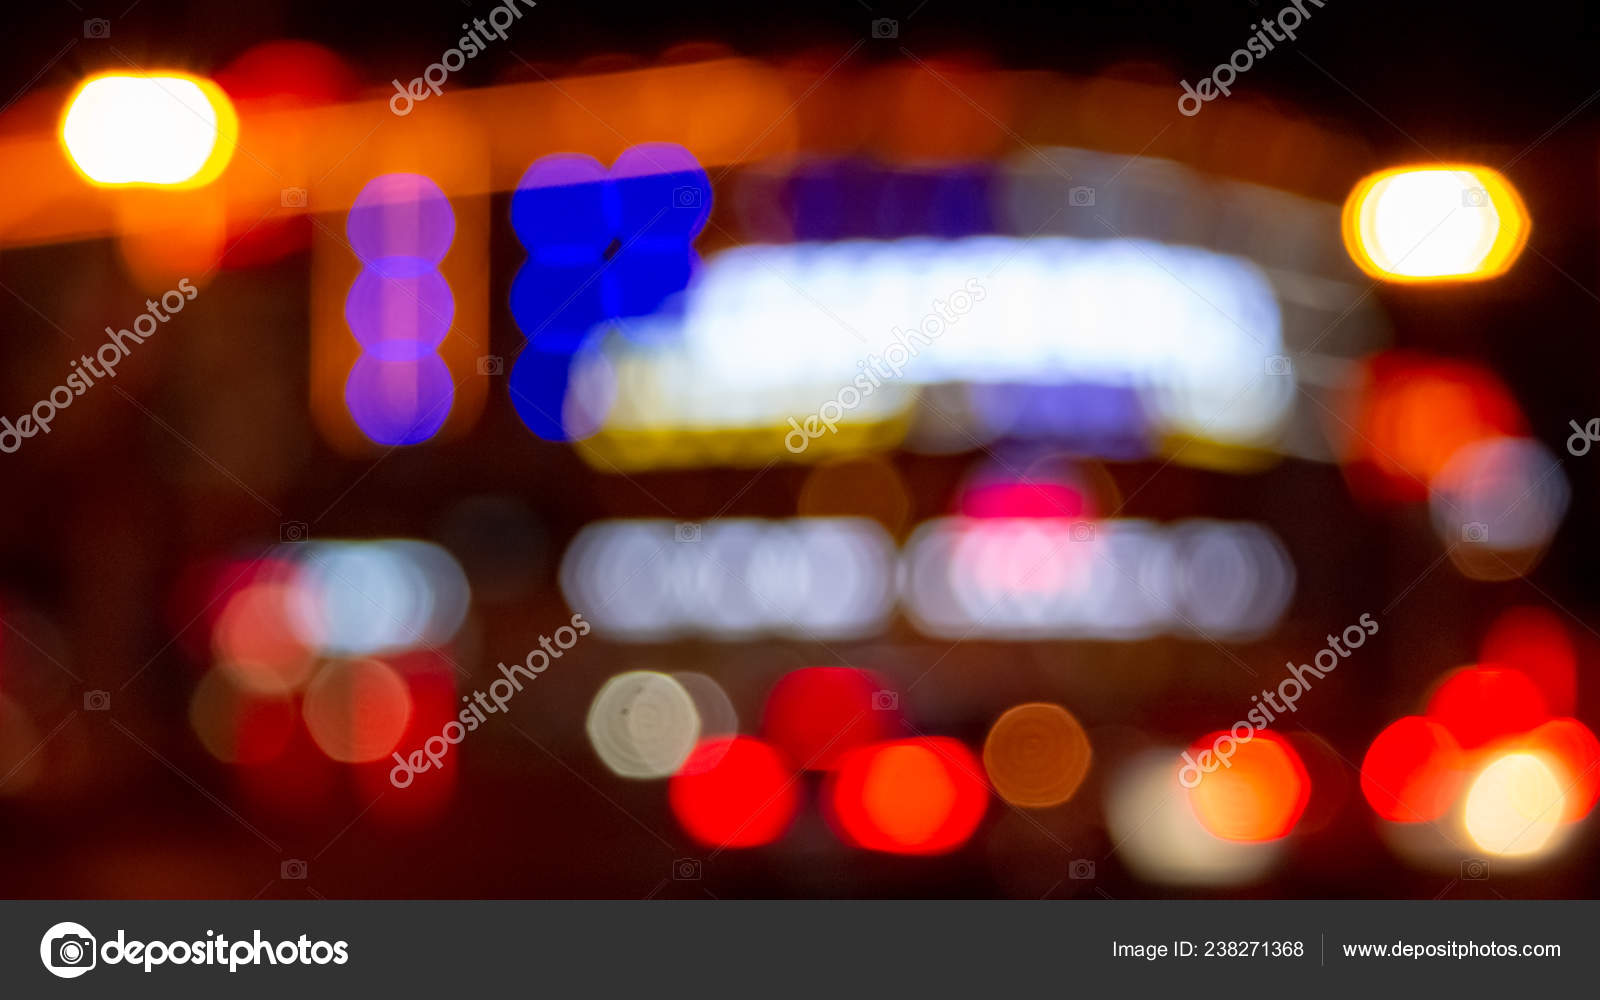 Urban Night Illumination Background Artificially Blurred